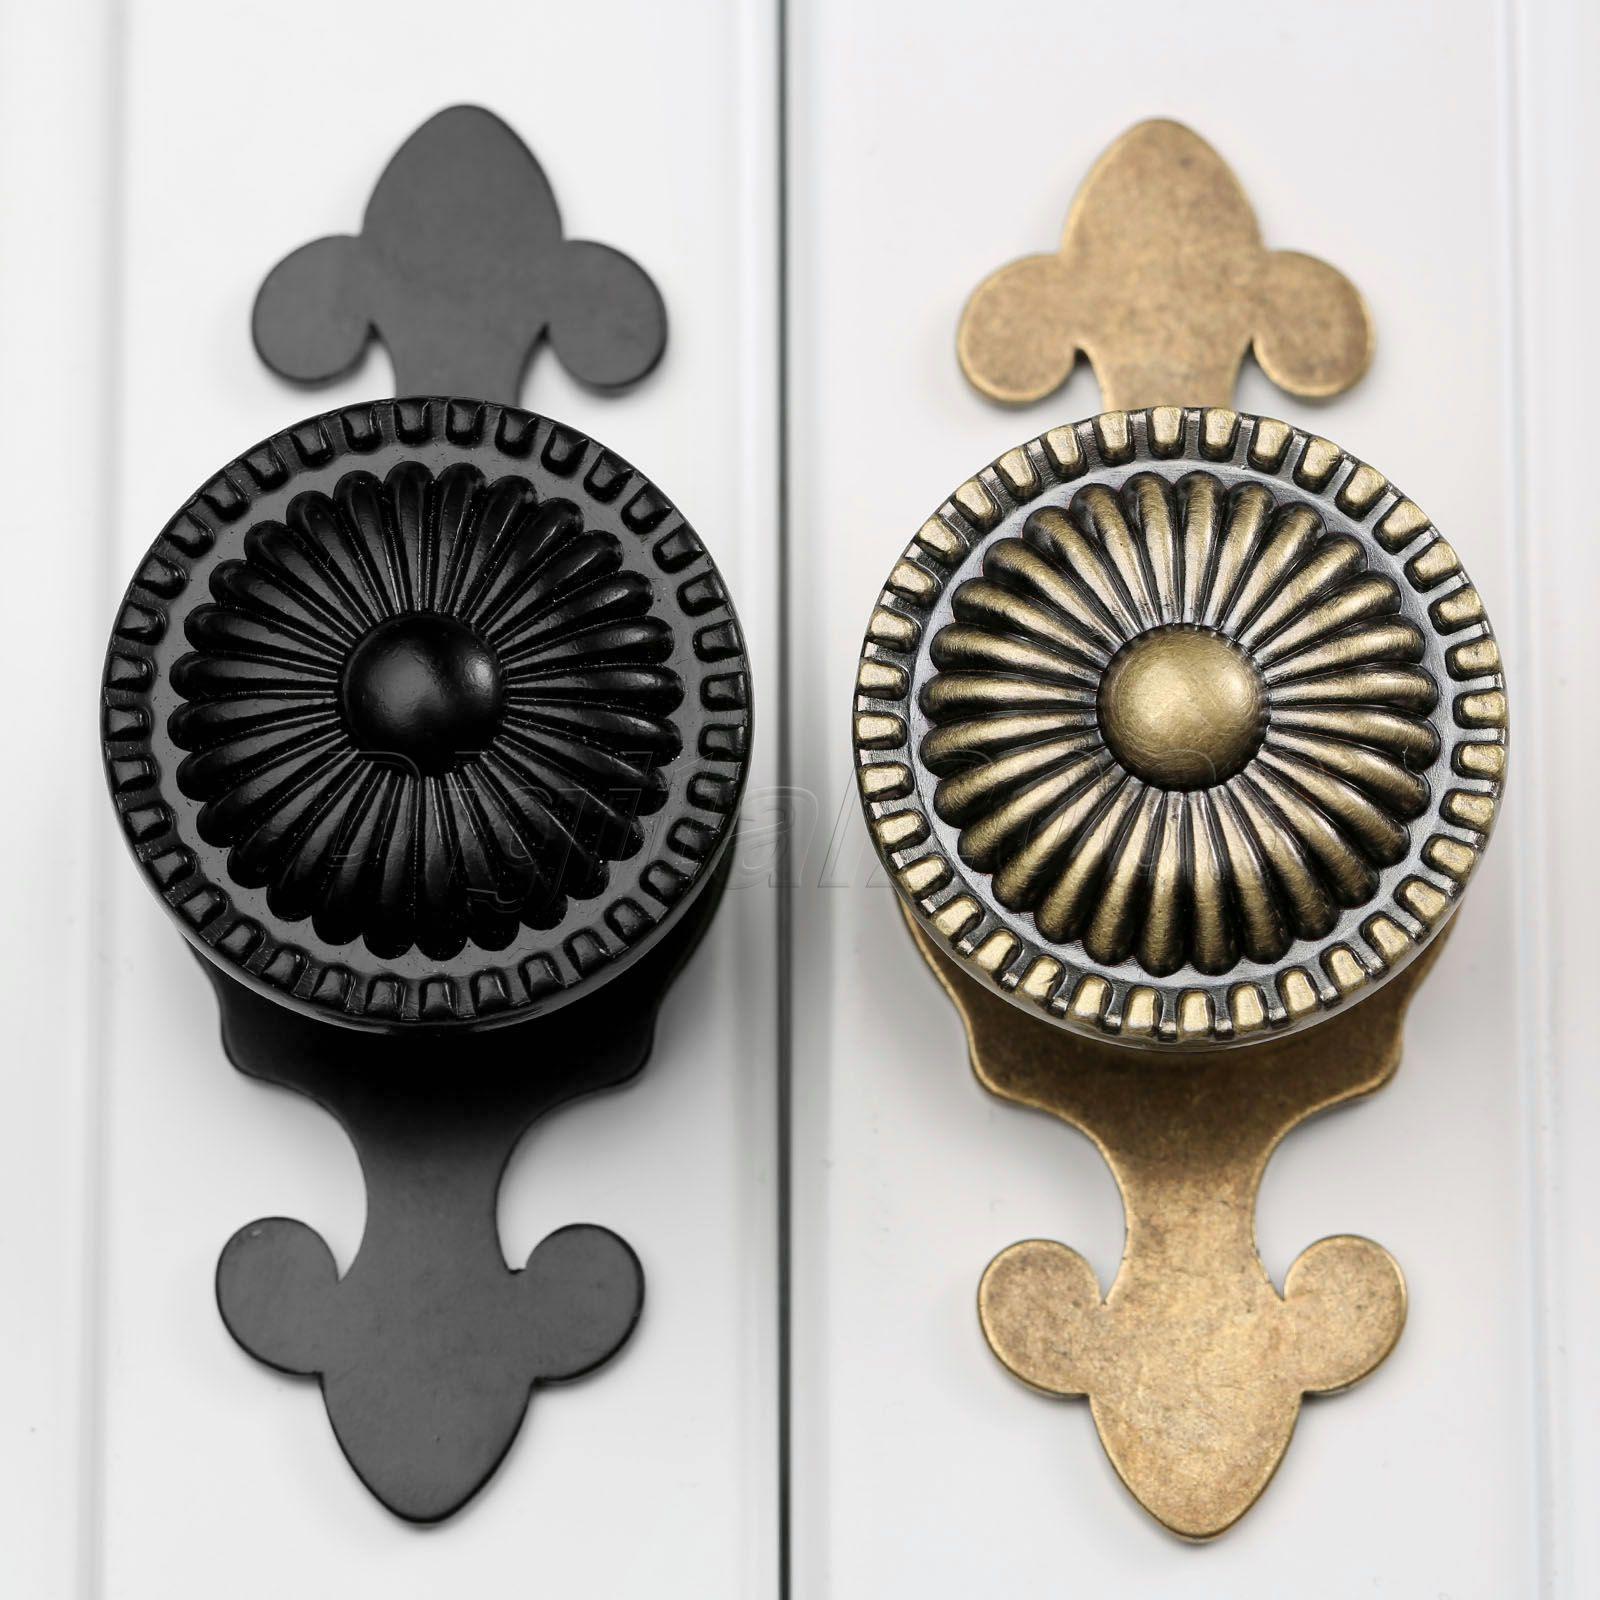 Bowarepro Antique Doorknob Drawer Knobs Gold Shoe Box